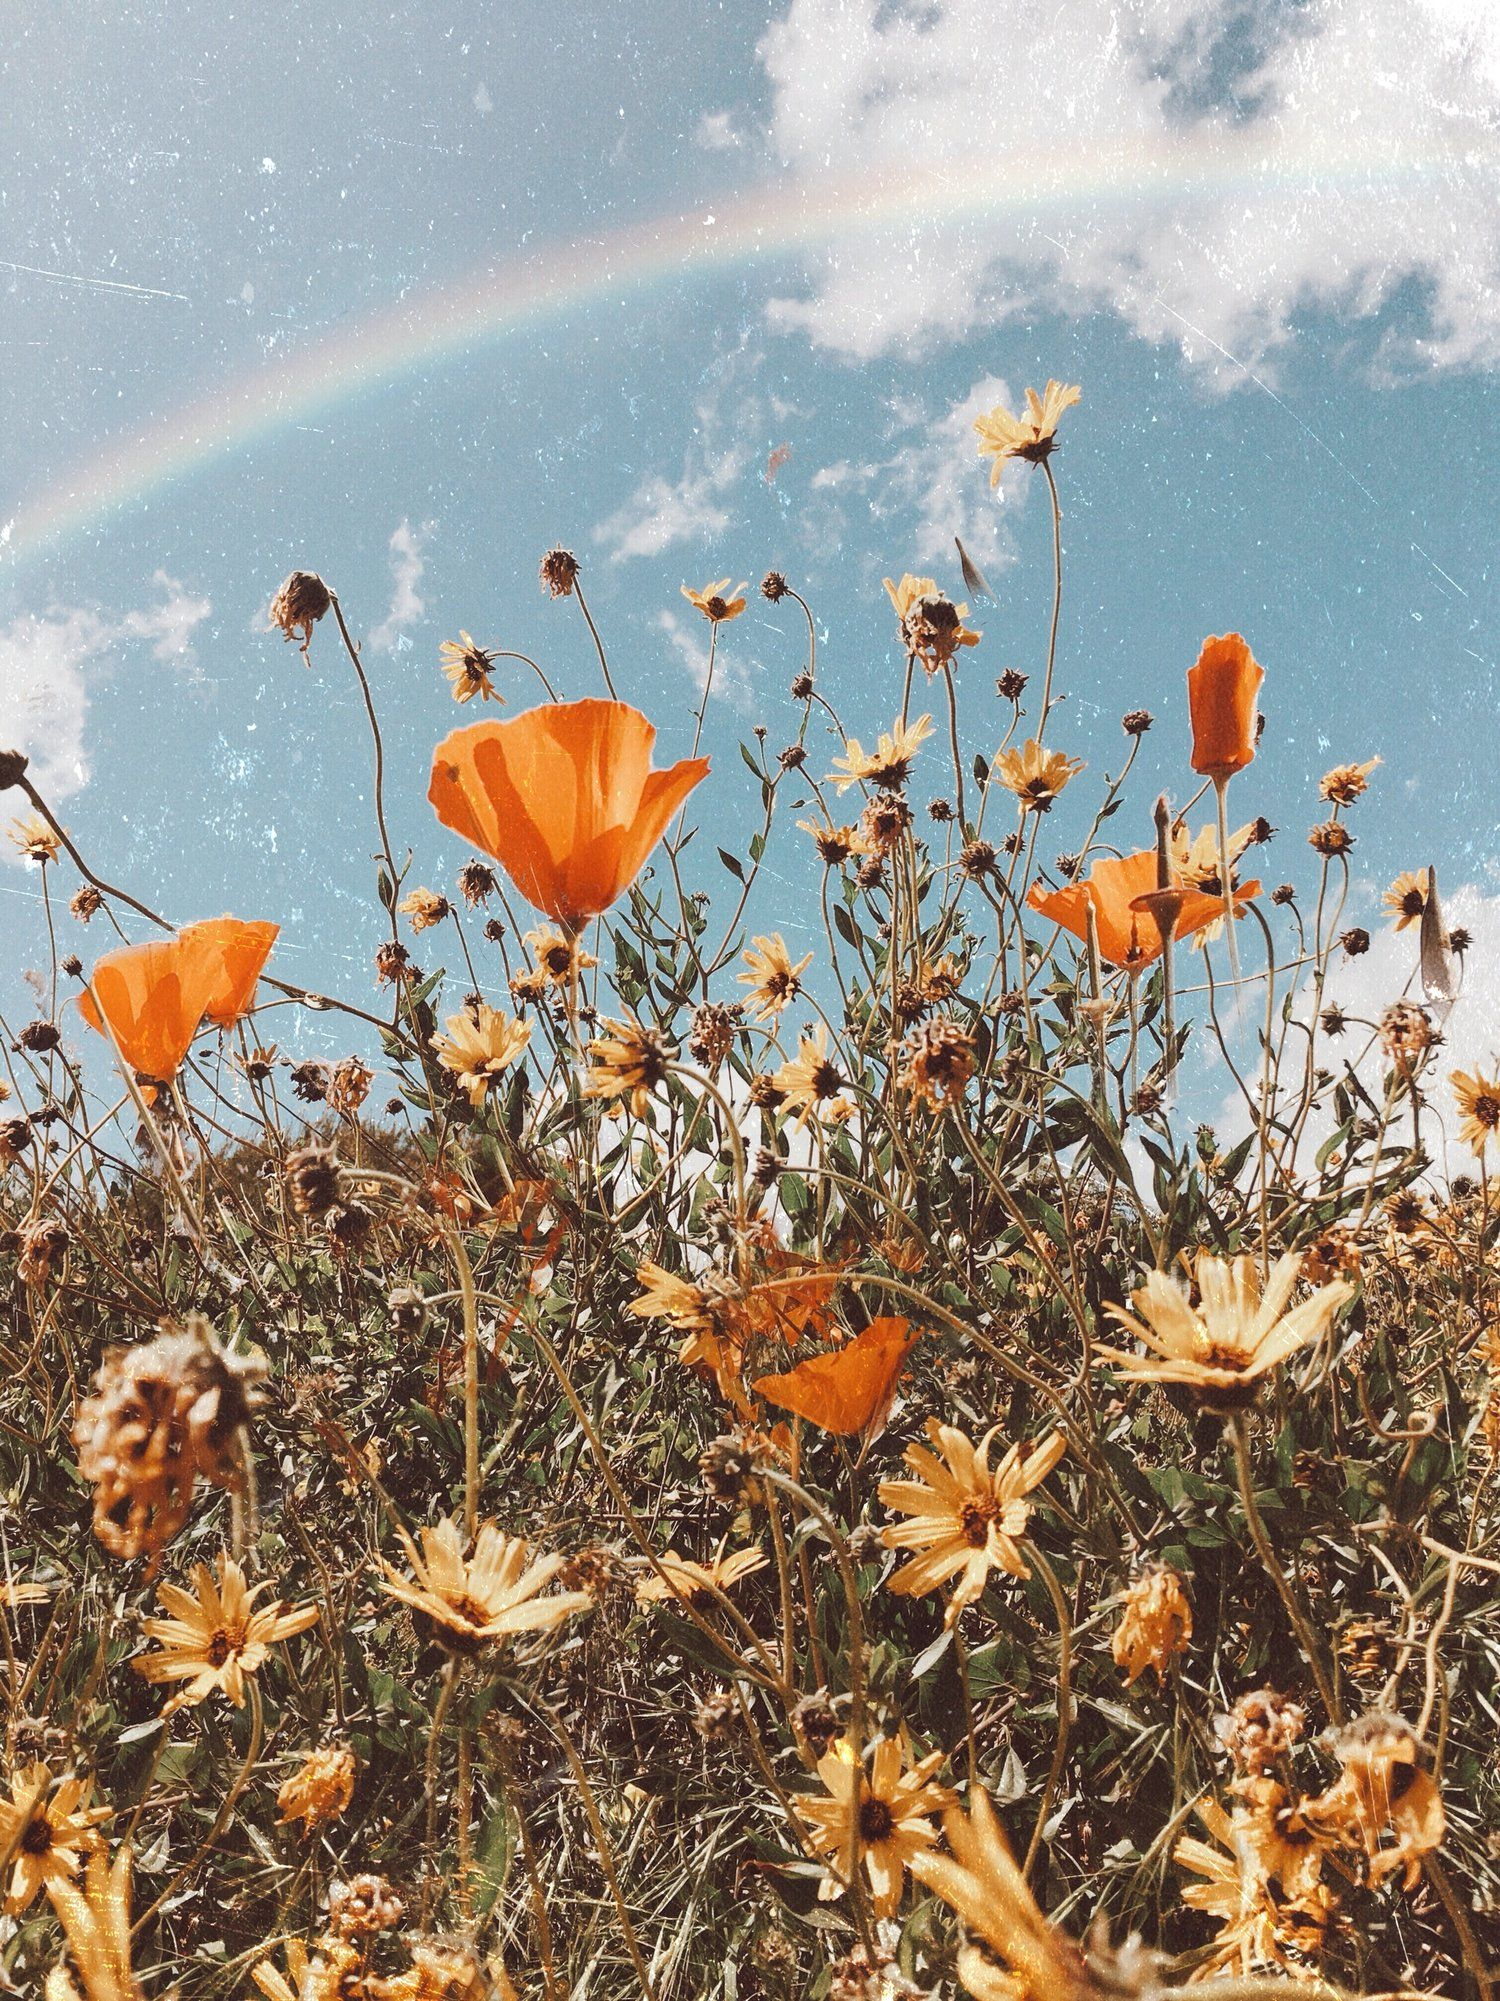 Grow A Map Of Dreams Flower Aesthetic Aesthetic Iphone Wallpaper Flower Wallpaper